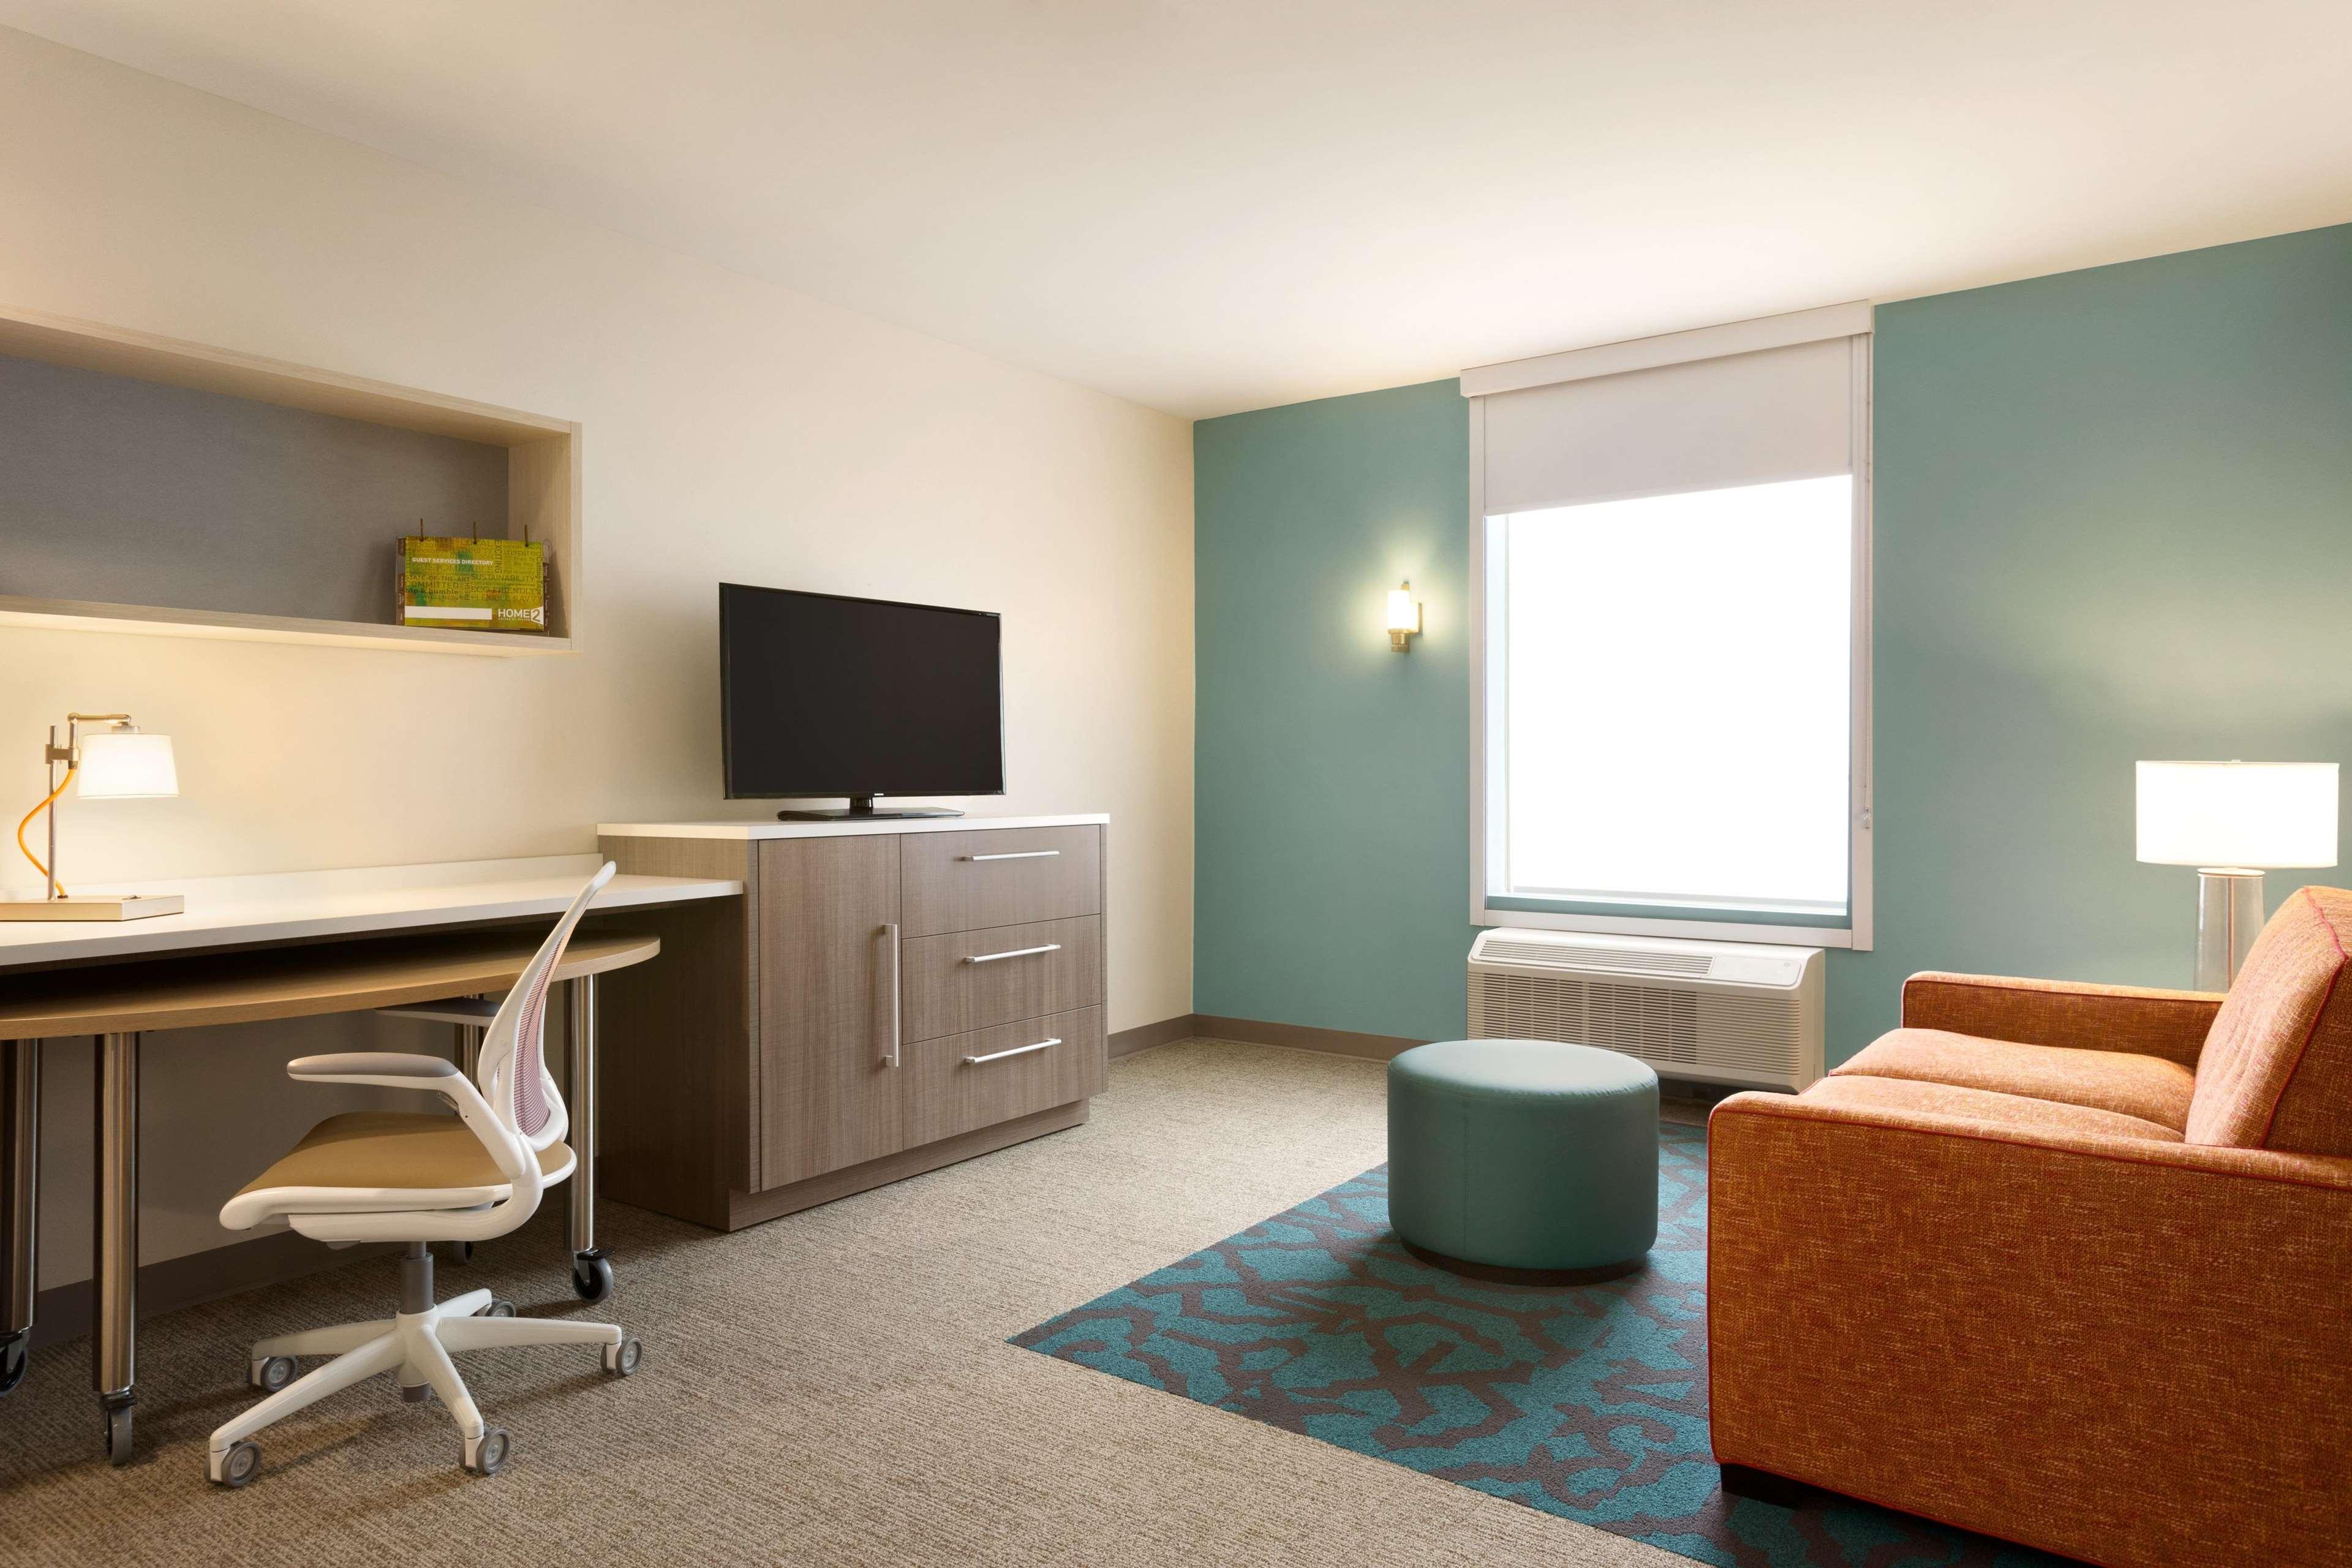 Home2 Suites by Hilton Florence Cincinnati Airport South image 17